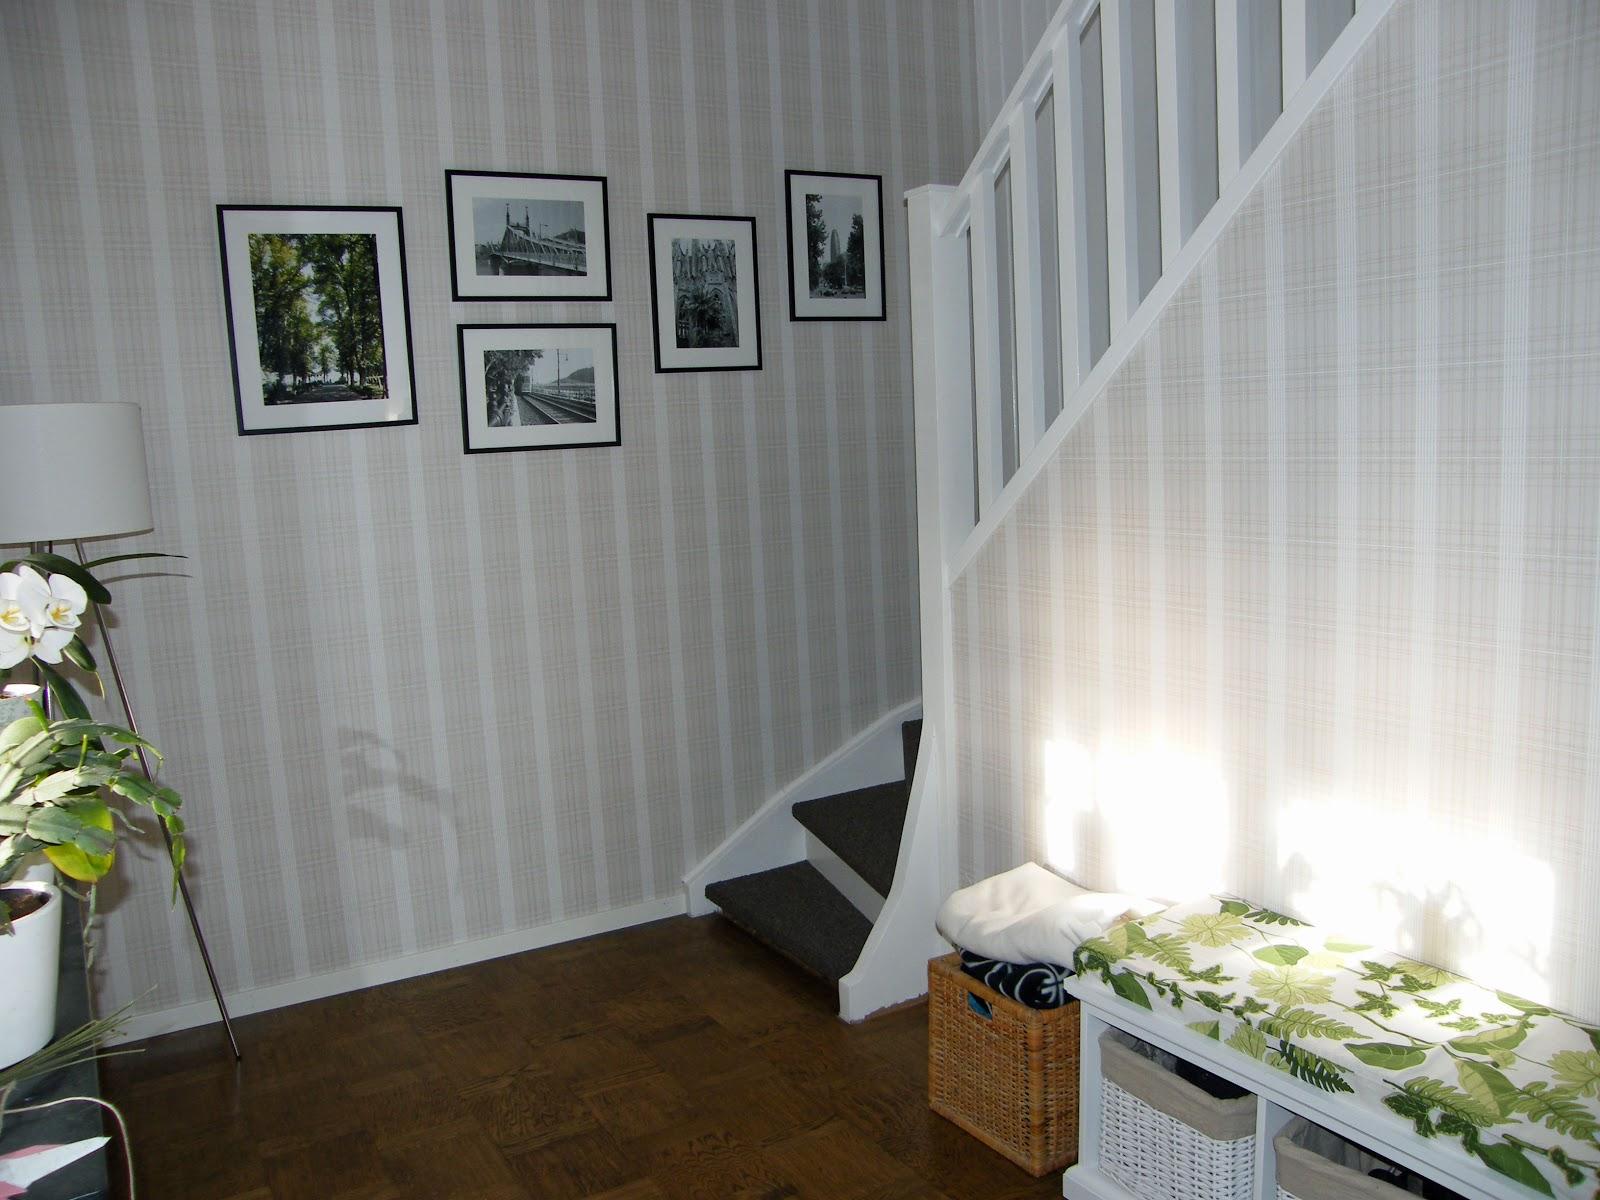 Frasses hus: oktober 2012